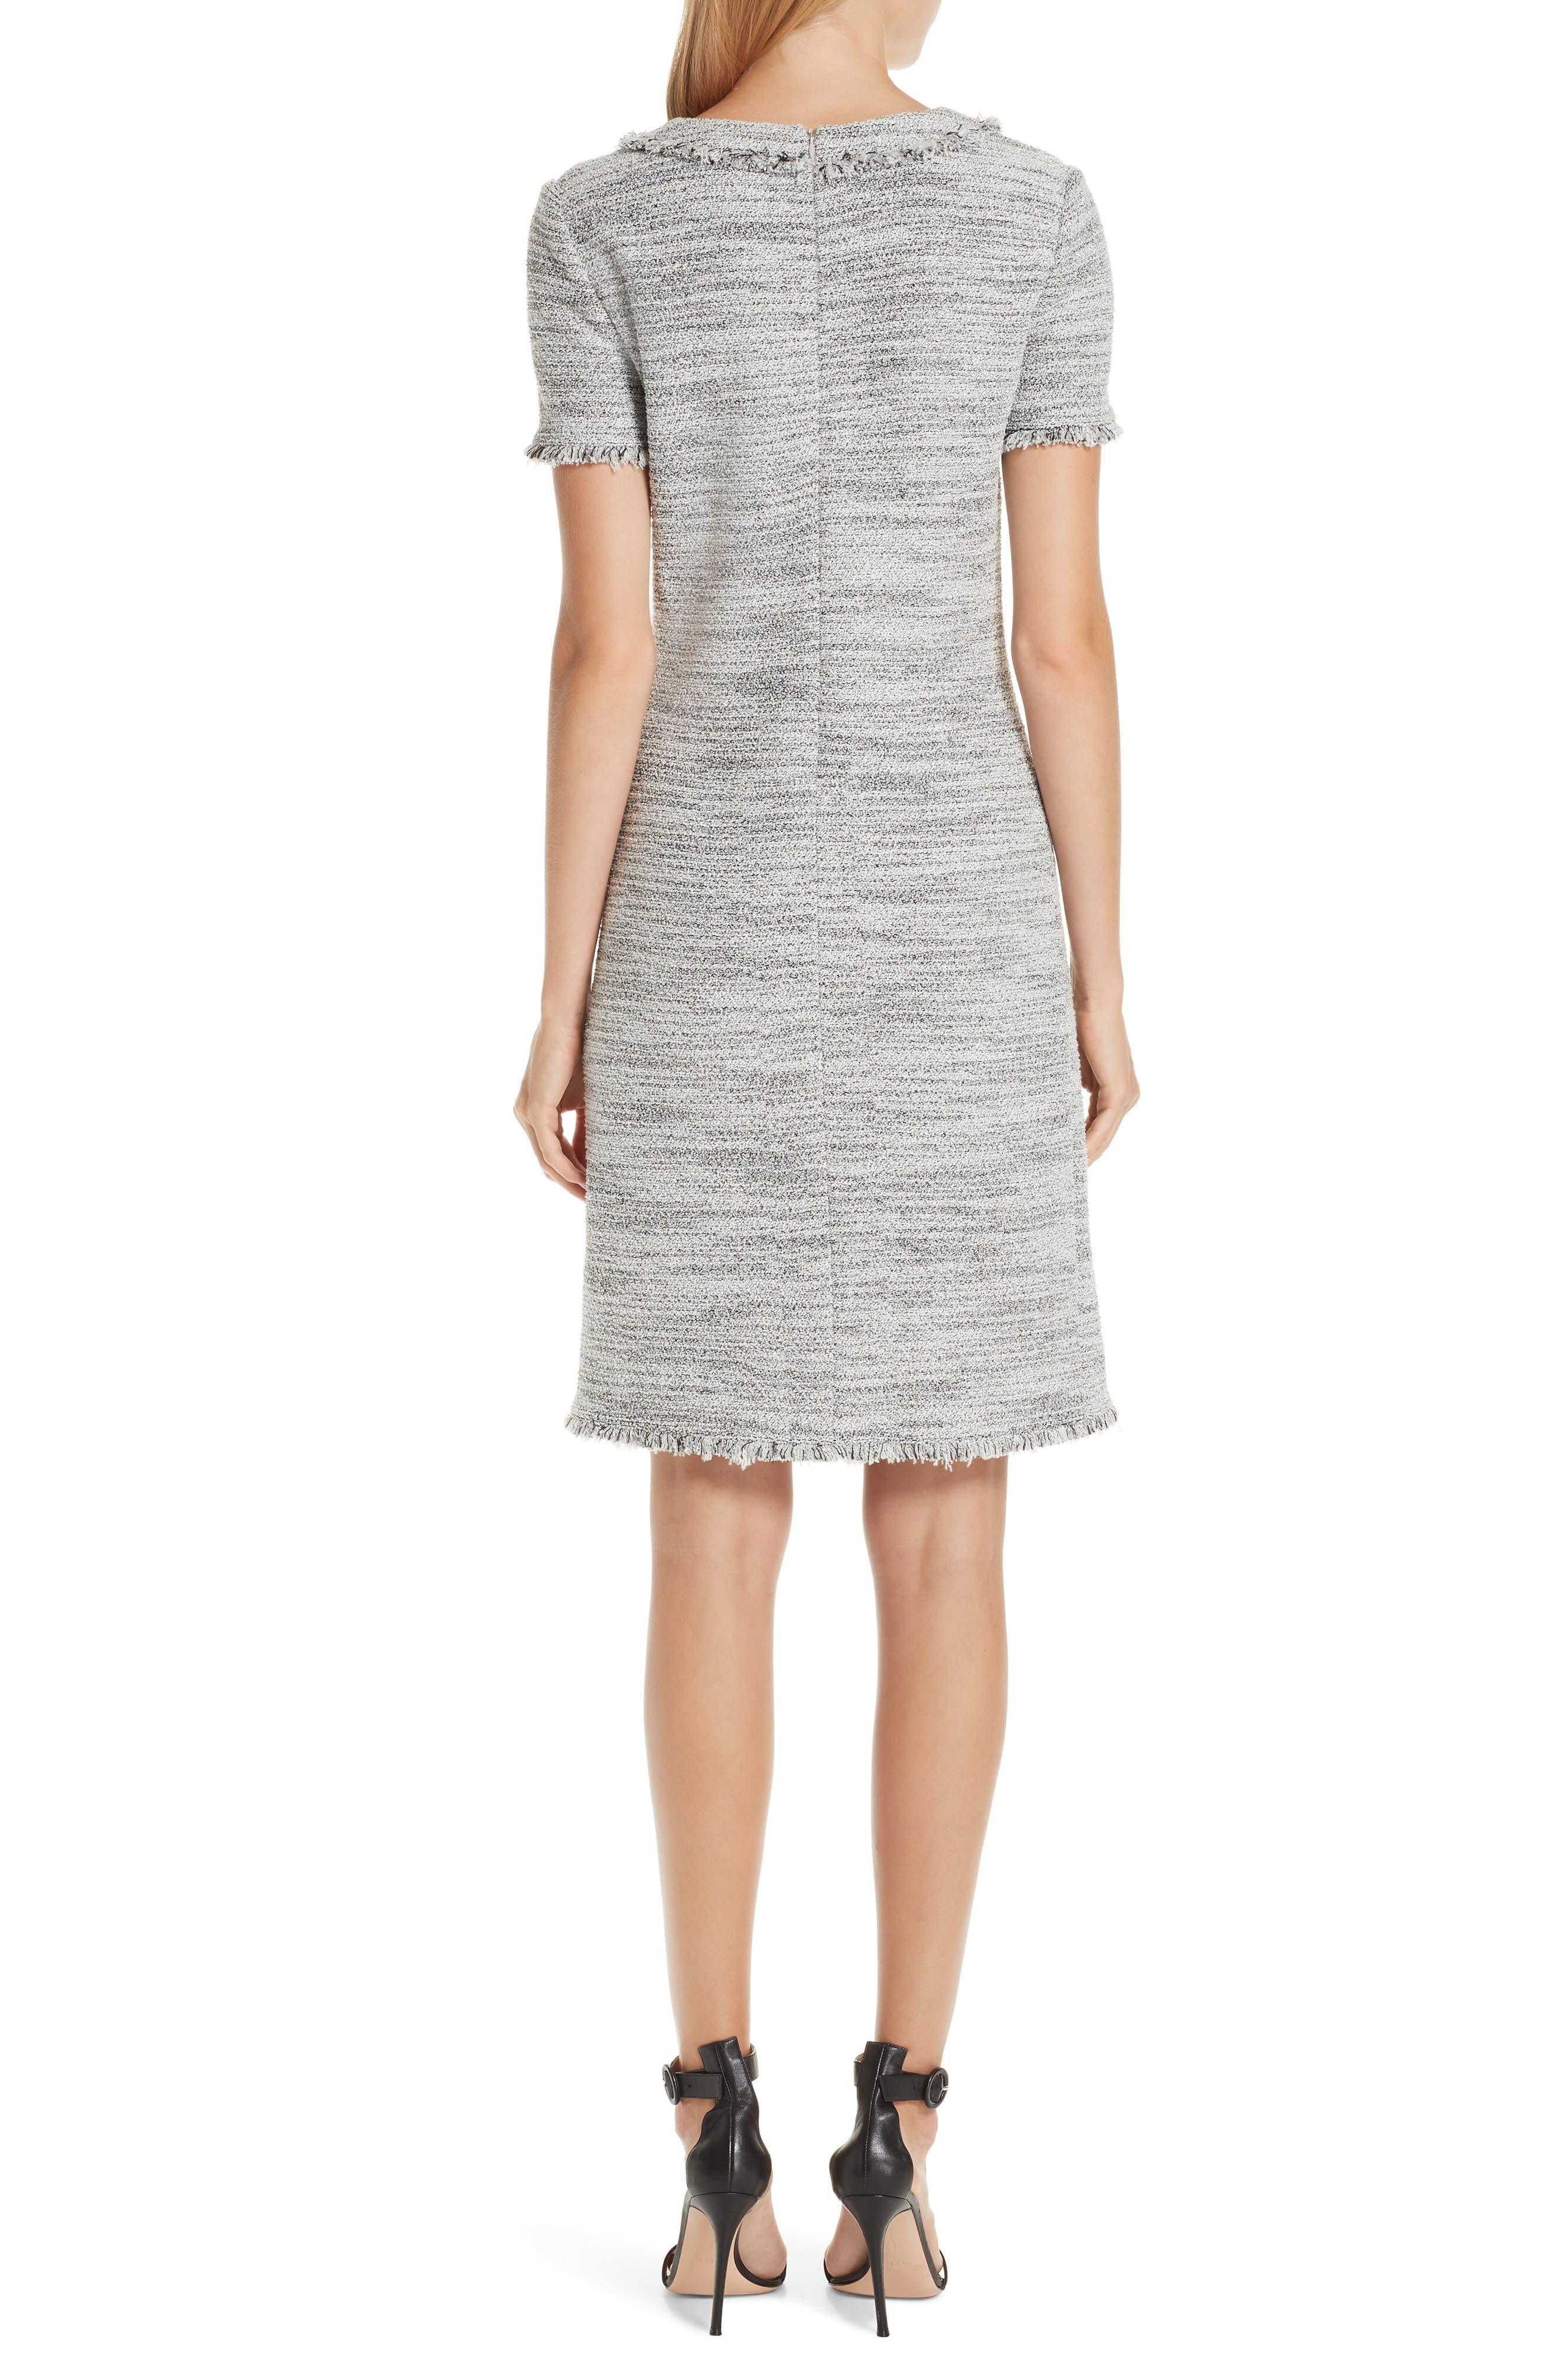 ST. JOHN COLLECTION, Eaton Place Tweed Knit Dress, Alternate thumbnail 2, color, CAVIAR/ CREAM